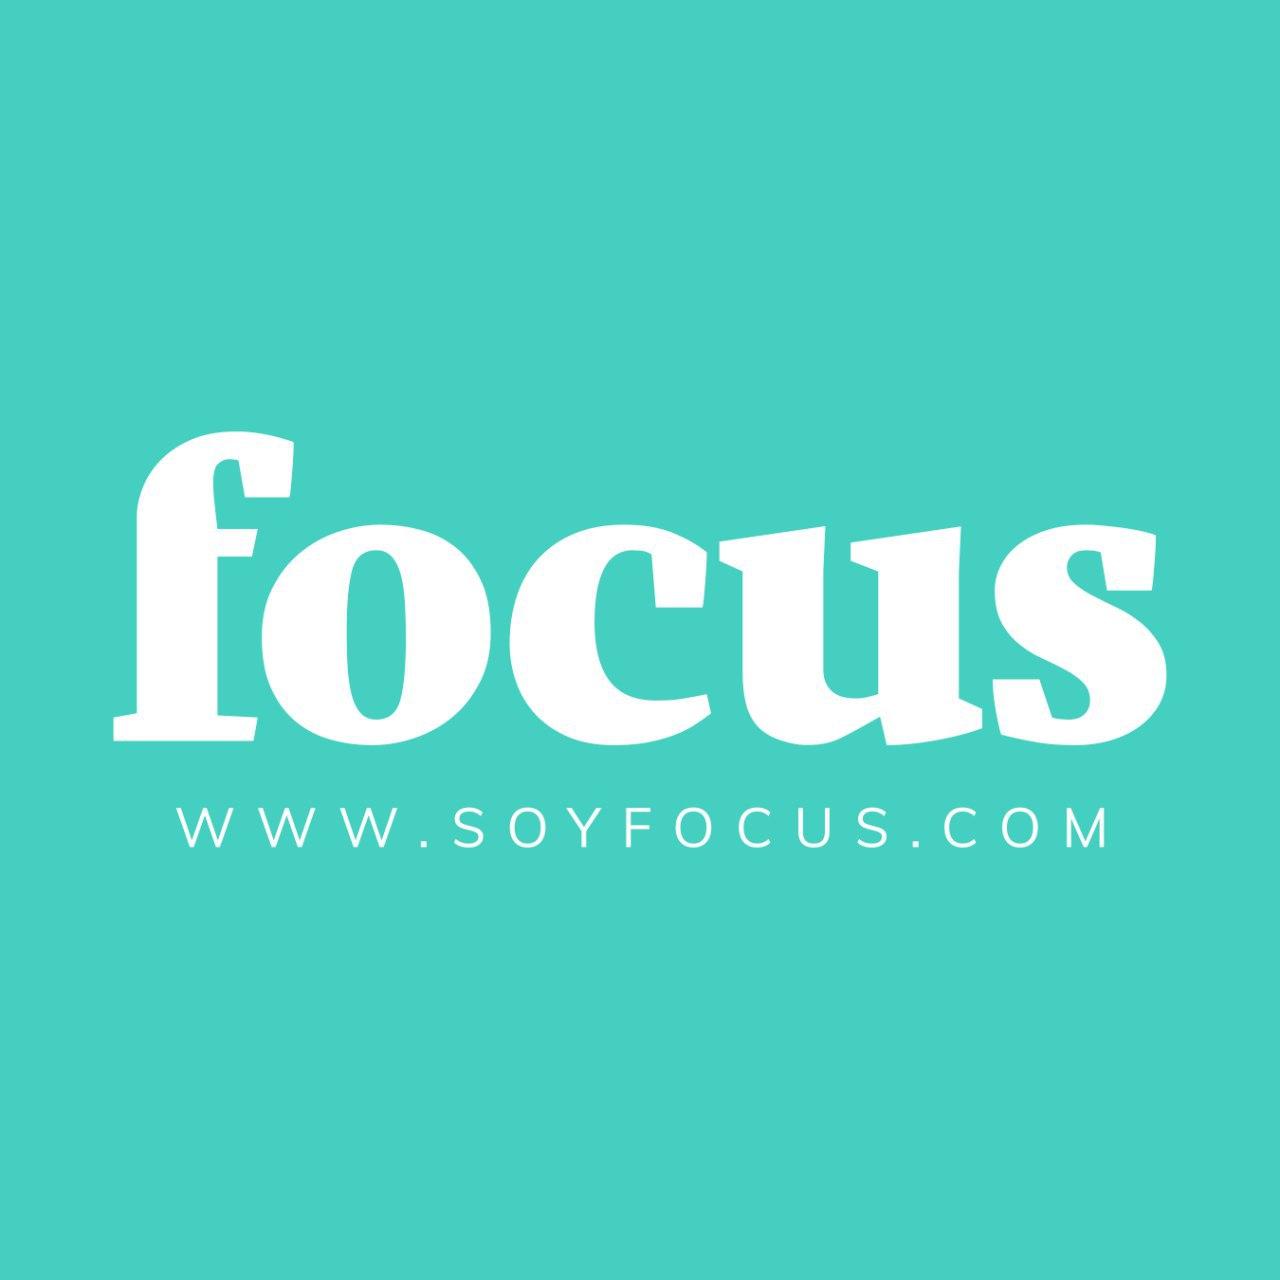 Focus Administradora General de Fondoa